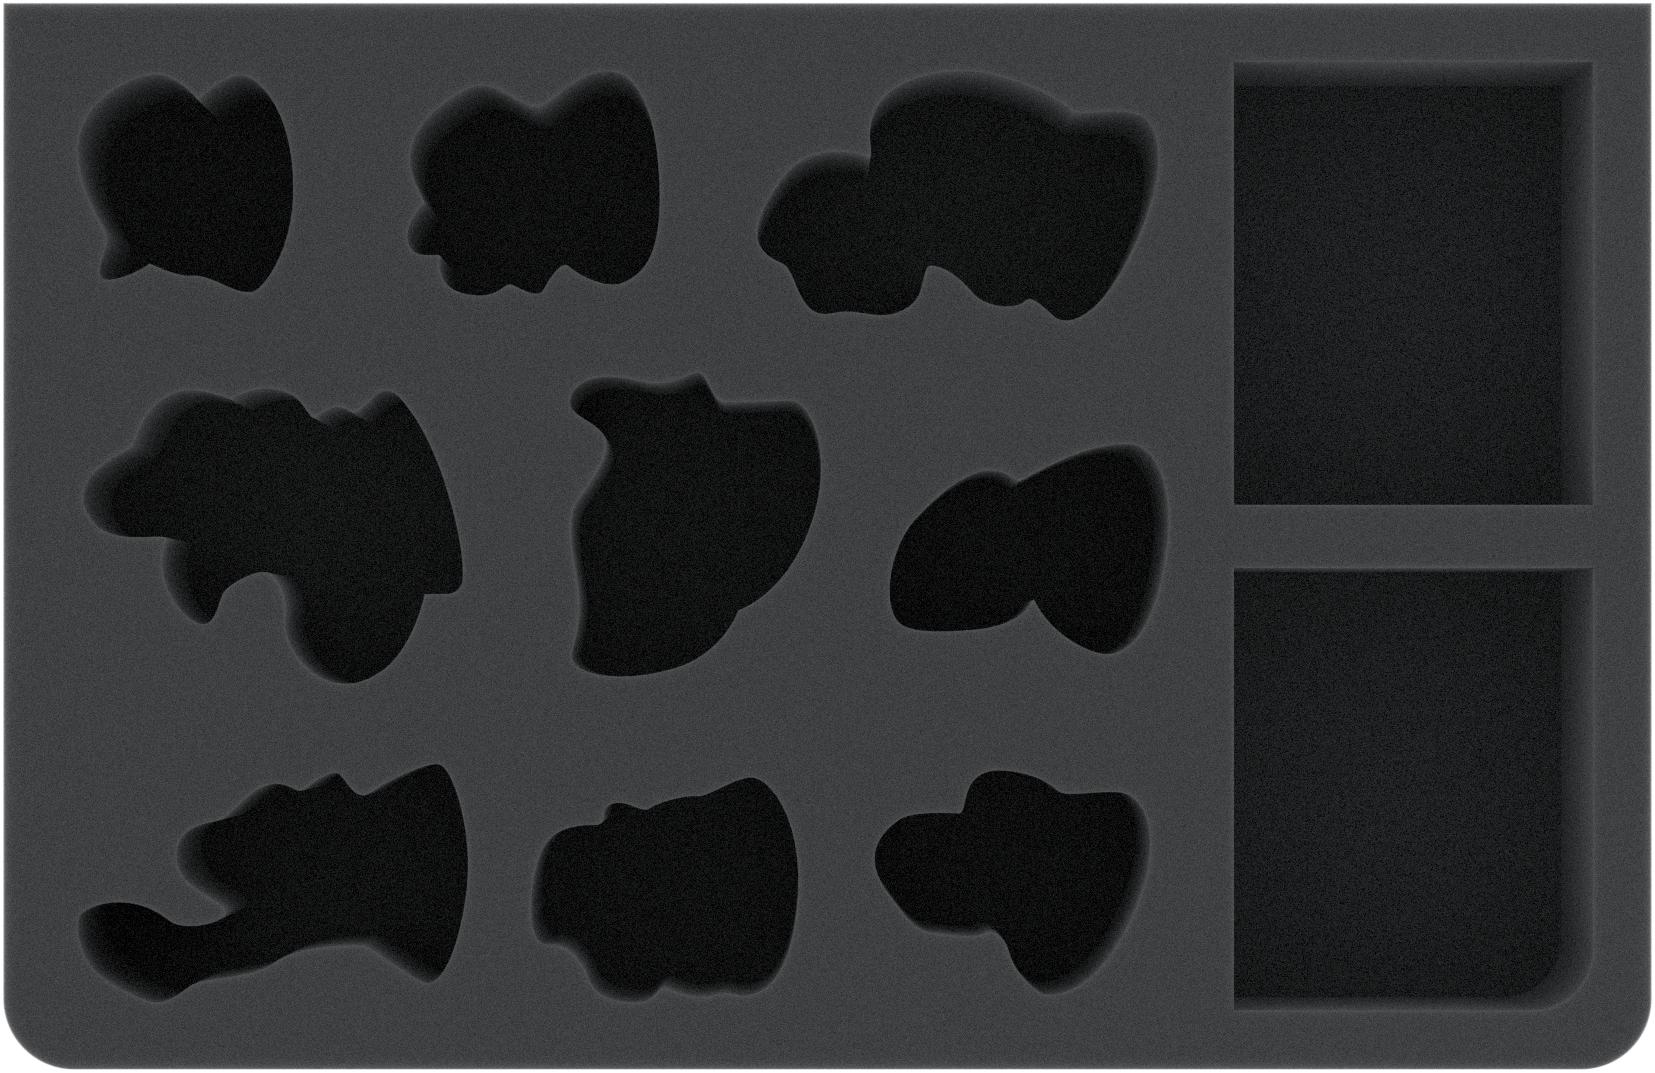 CQMEIK050BO Feldherr GWA-Size foam tray for Nightvault - Zarbag's Gitz